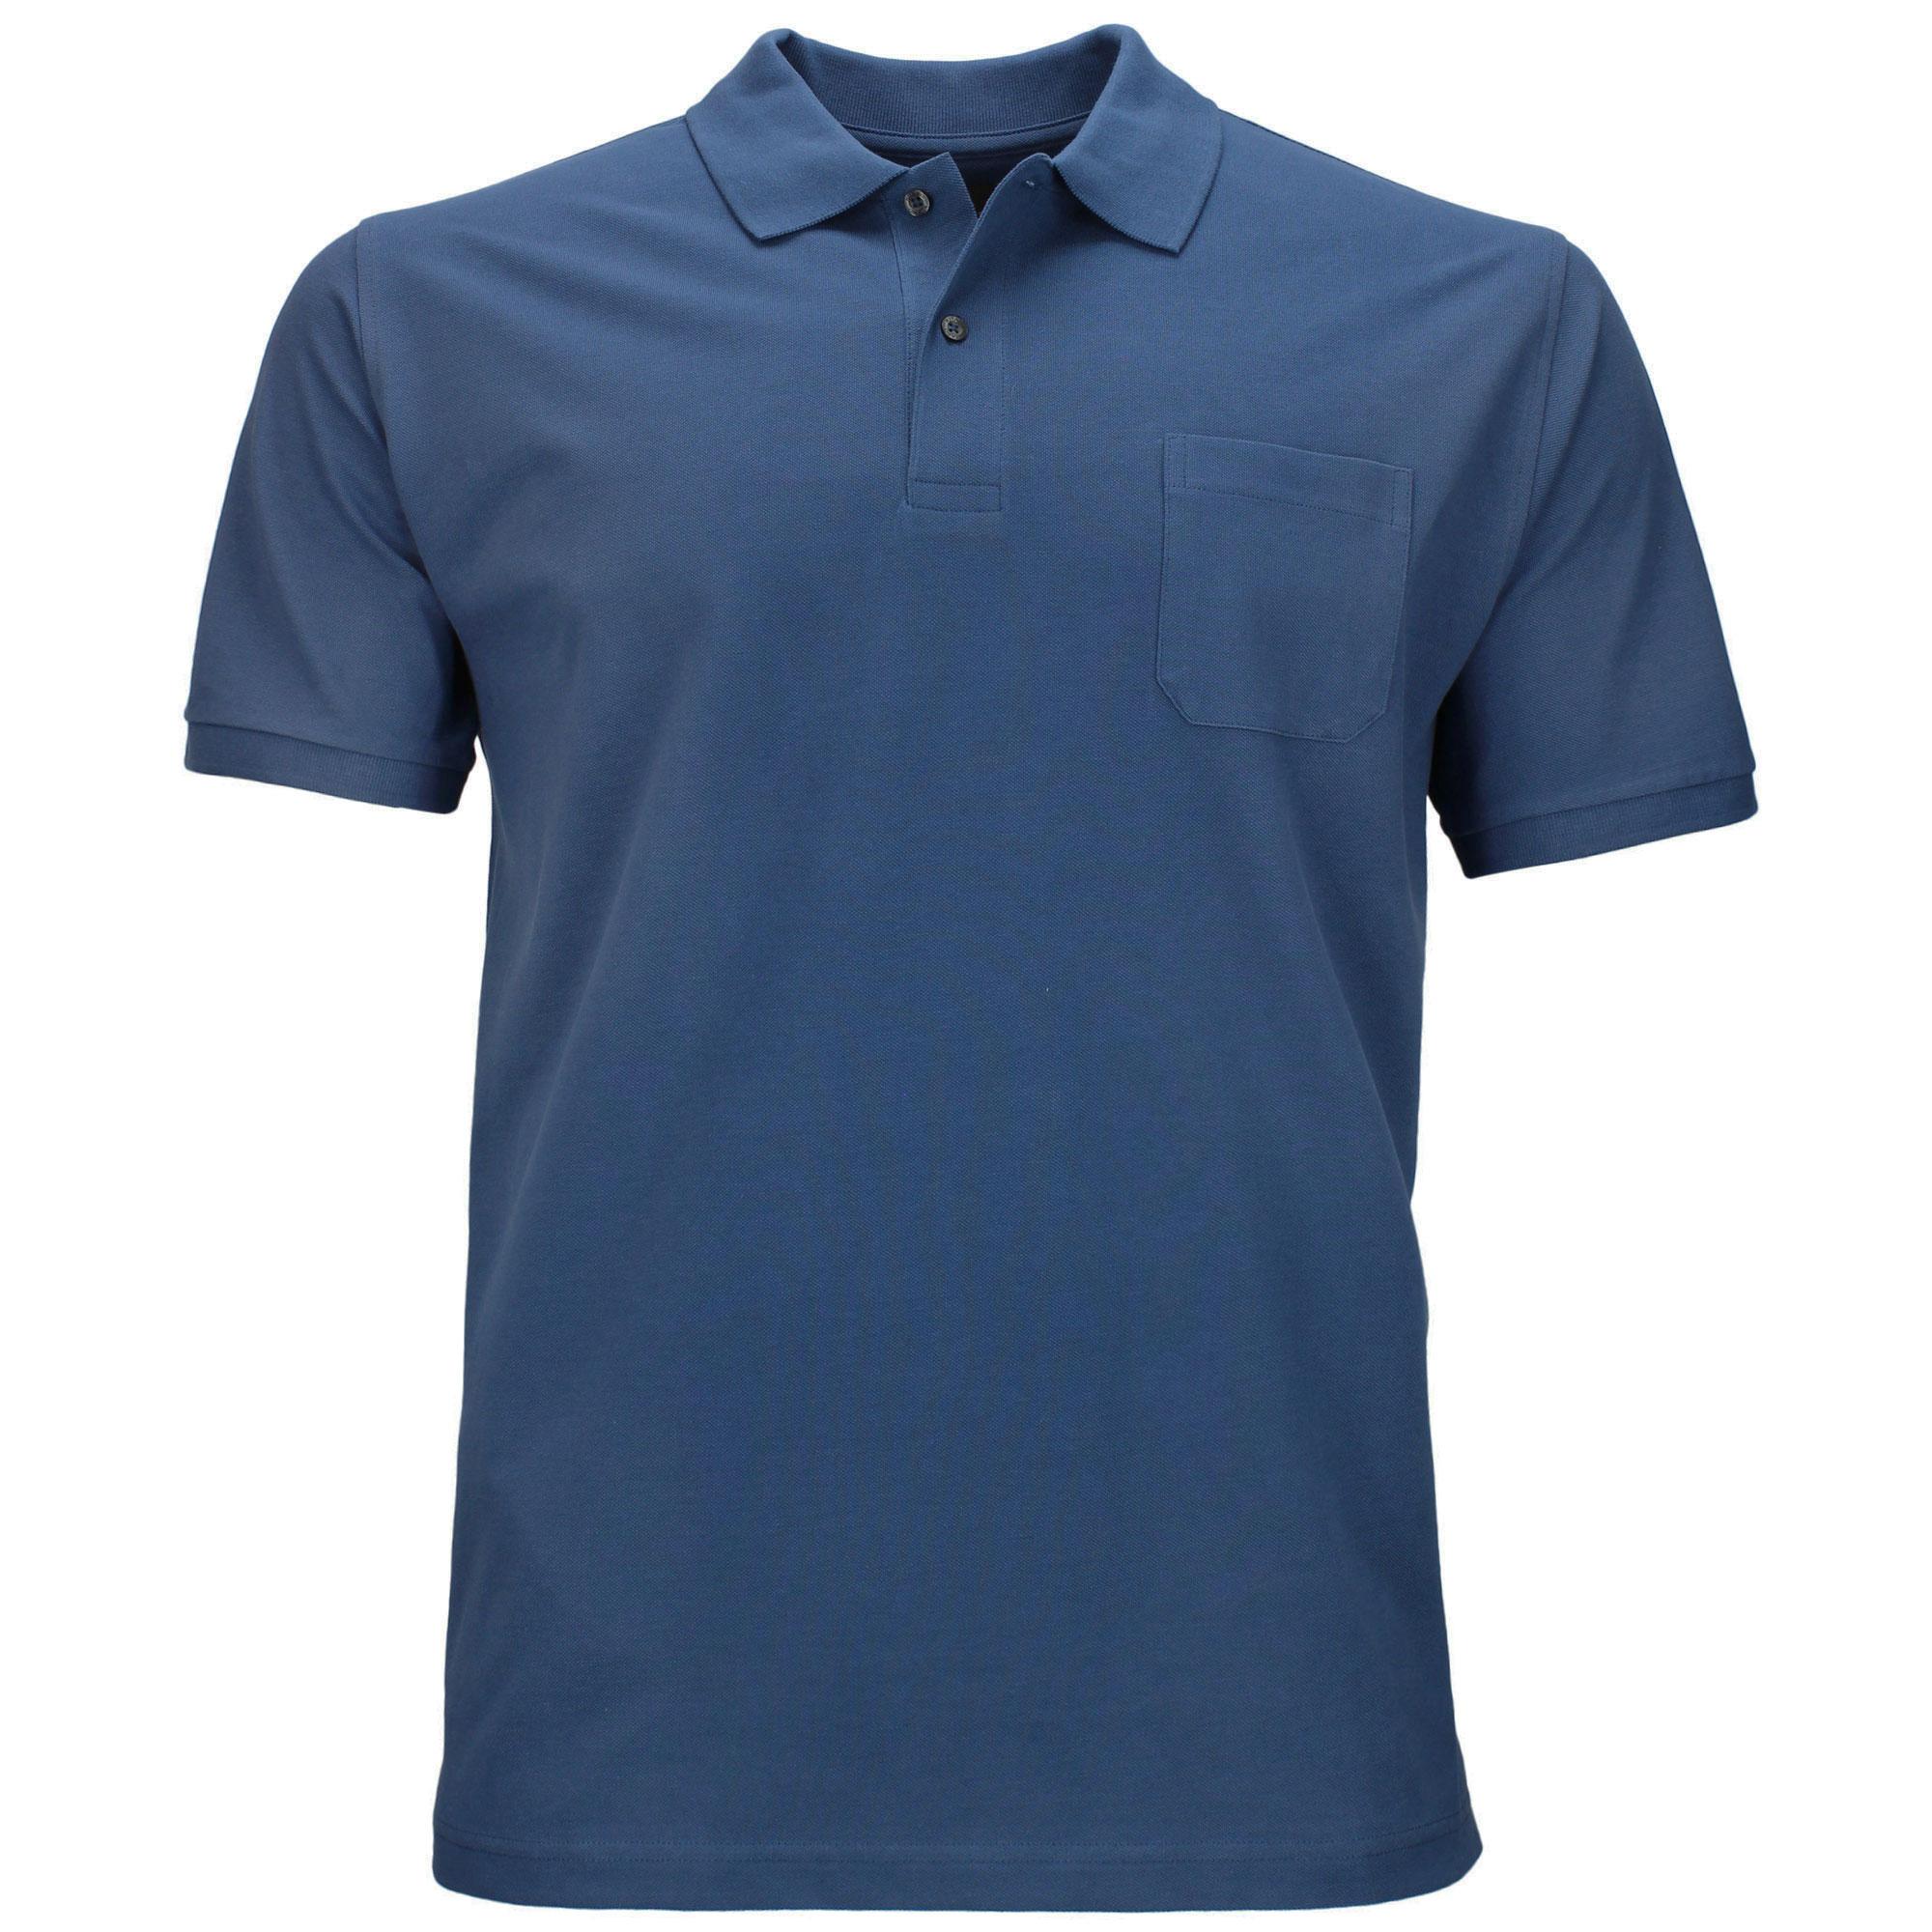 Kitaro Poloshirt große Größen - jeansblau 5bc1d43efc